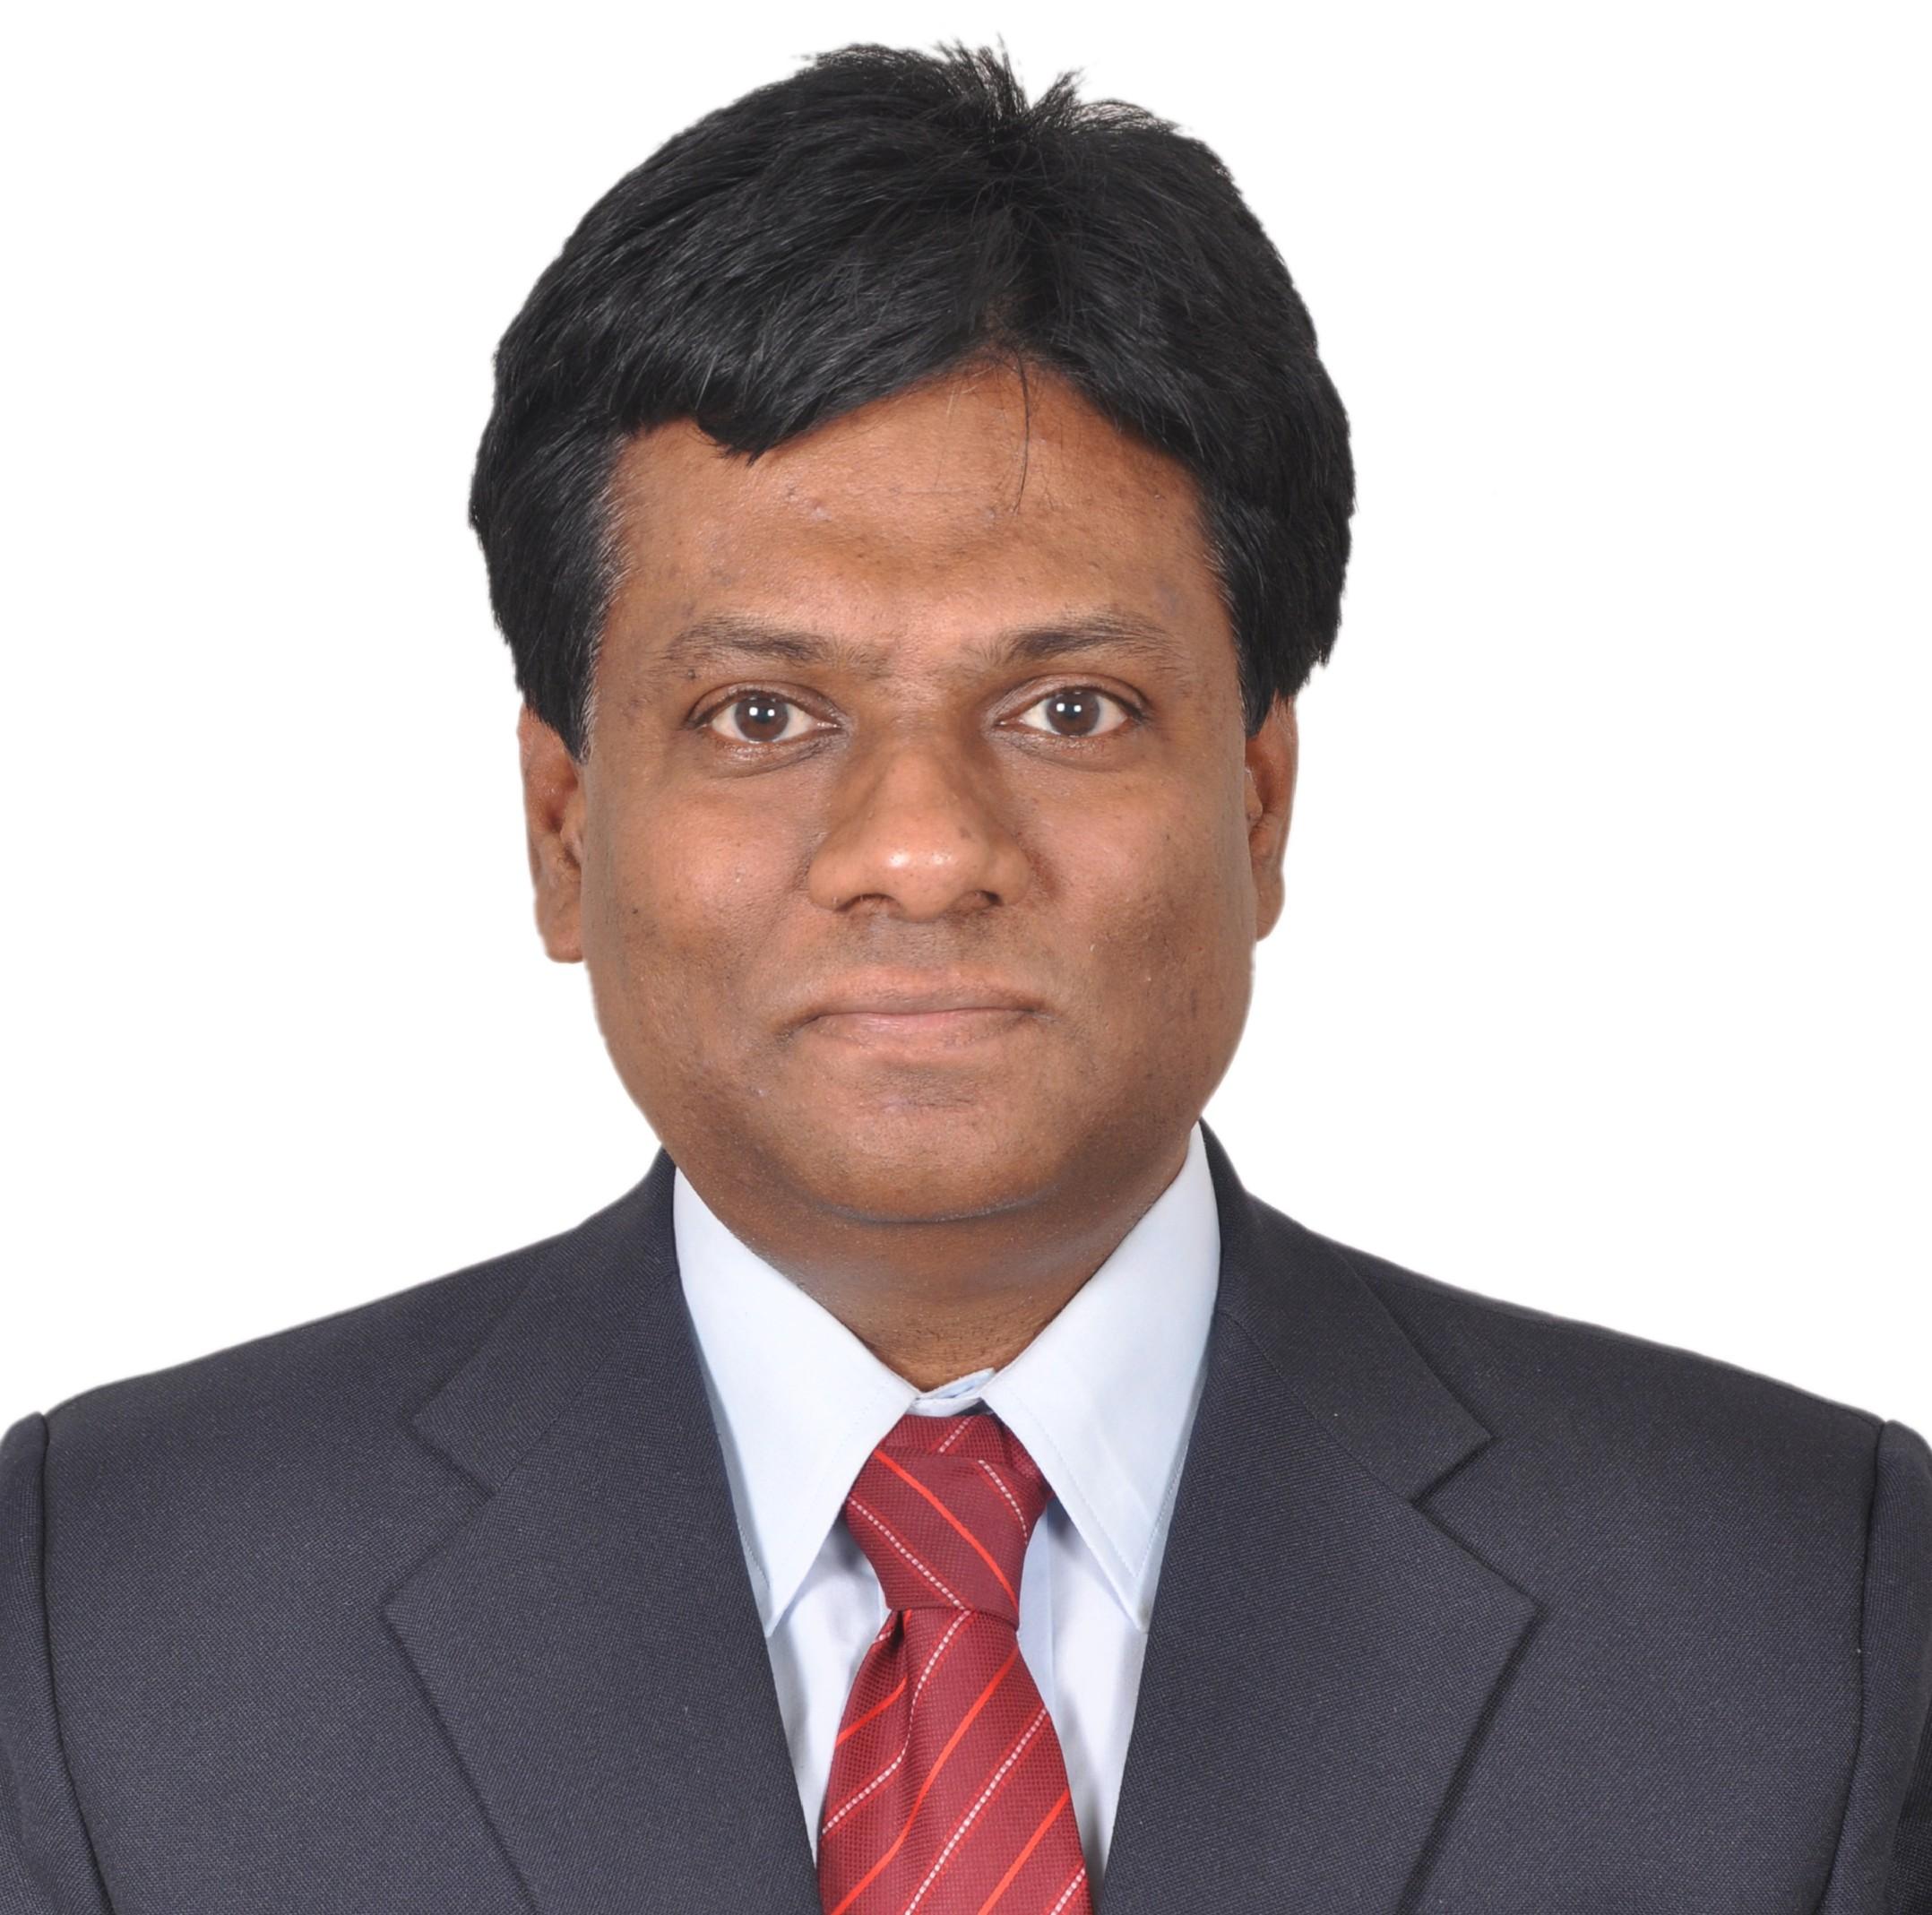 Prof. (Dr.) Sundarapandian Vaidyanathan